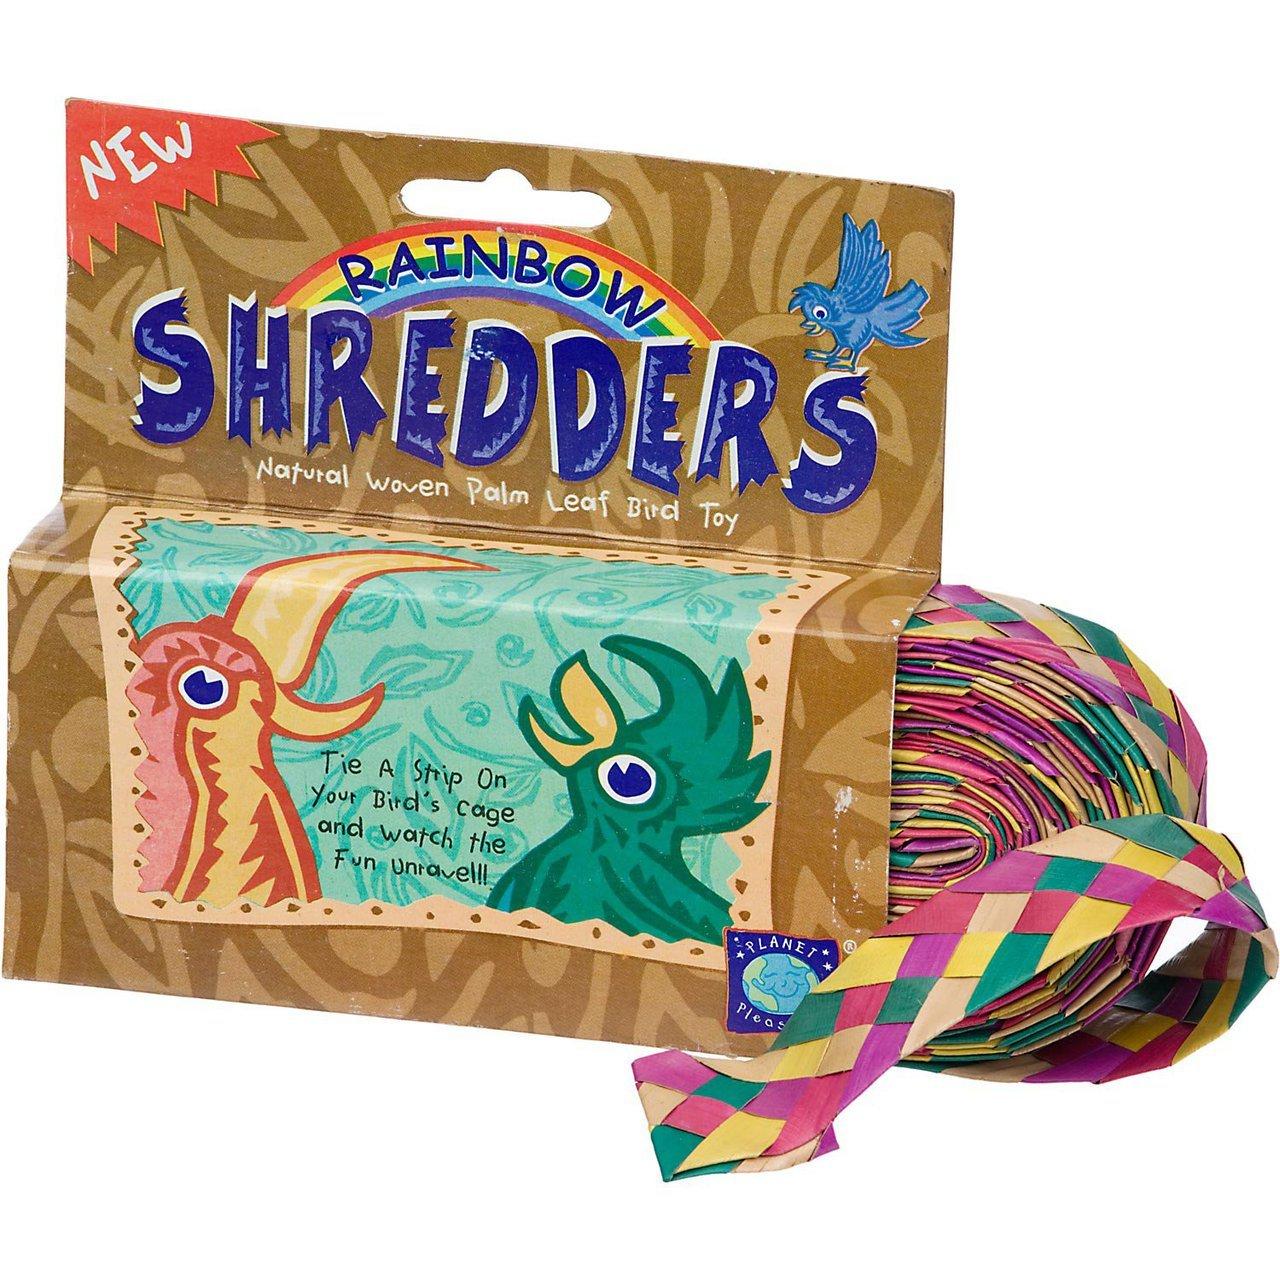 03137 Small Straight Rainbow Shredder